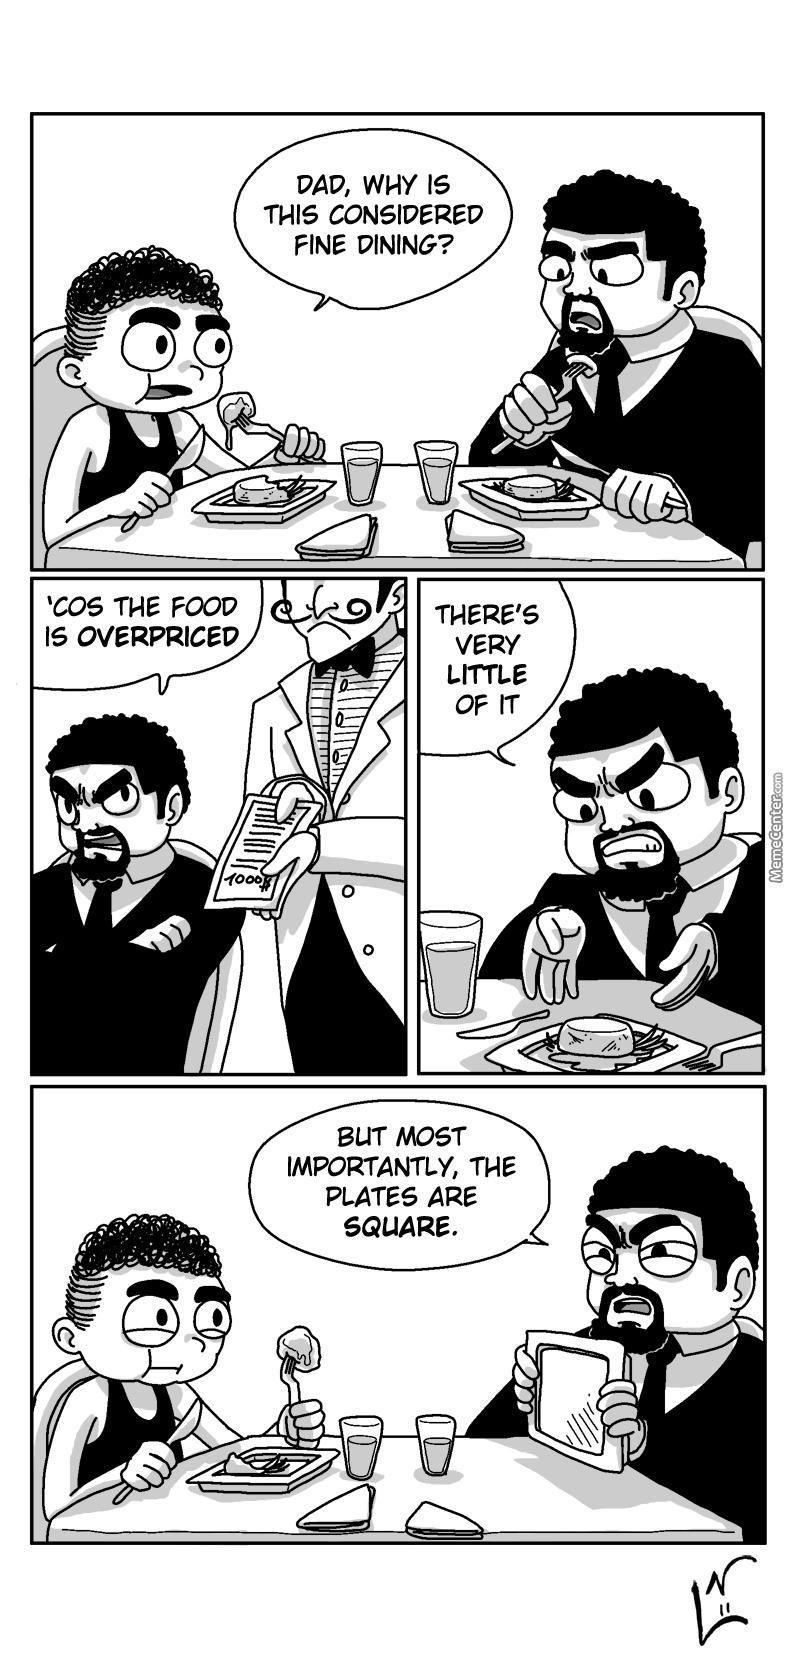 i-prefer-simple-meals-though_o_3979325.jpg